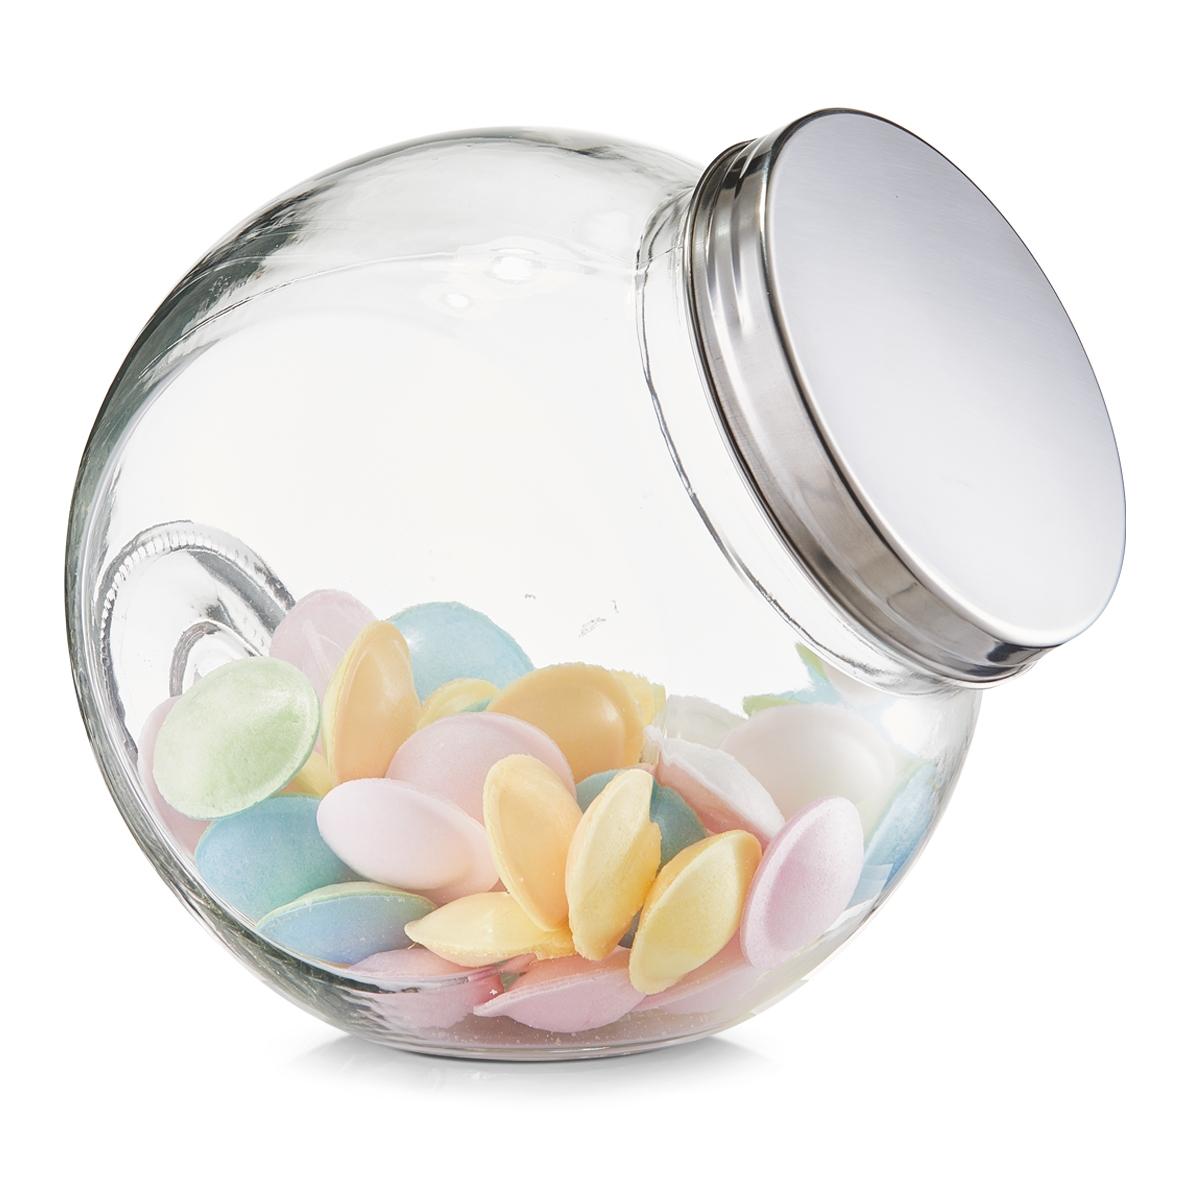 Borcan pentru depozitare din sticla Candy, capac metalic, 2900 ml, l19xA13,5xH19 cm